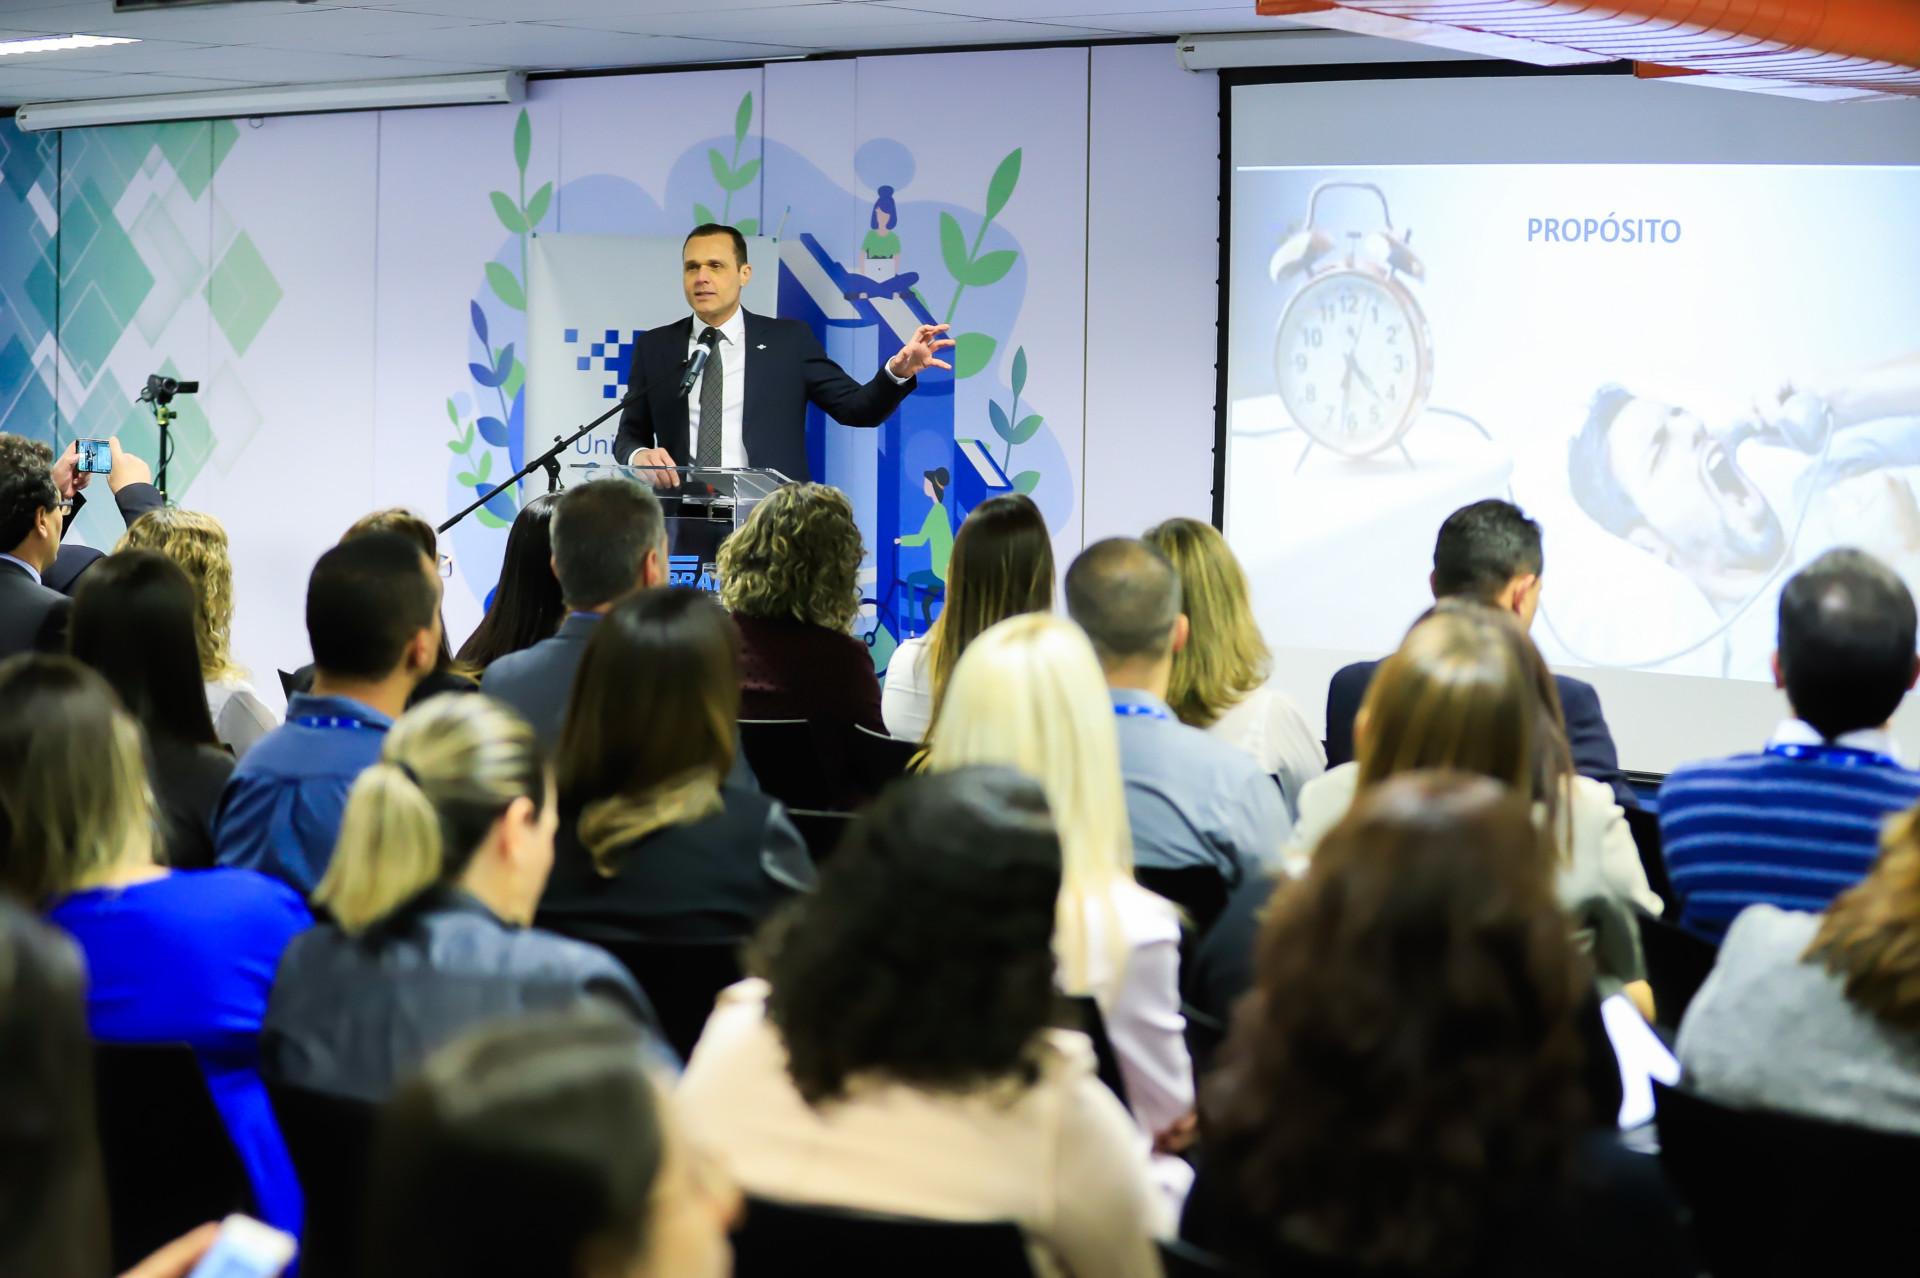 Palestra Sobre o Líder Regenerador na Universidade Corporativa Sebrae